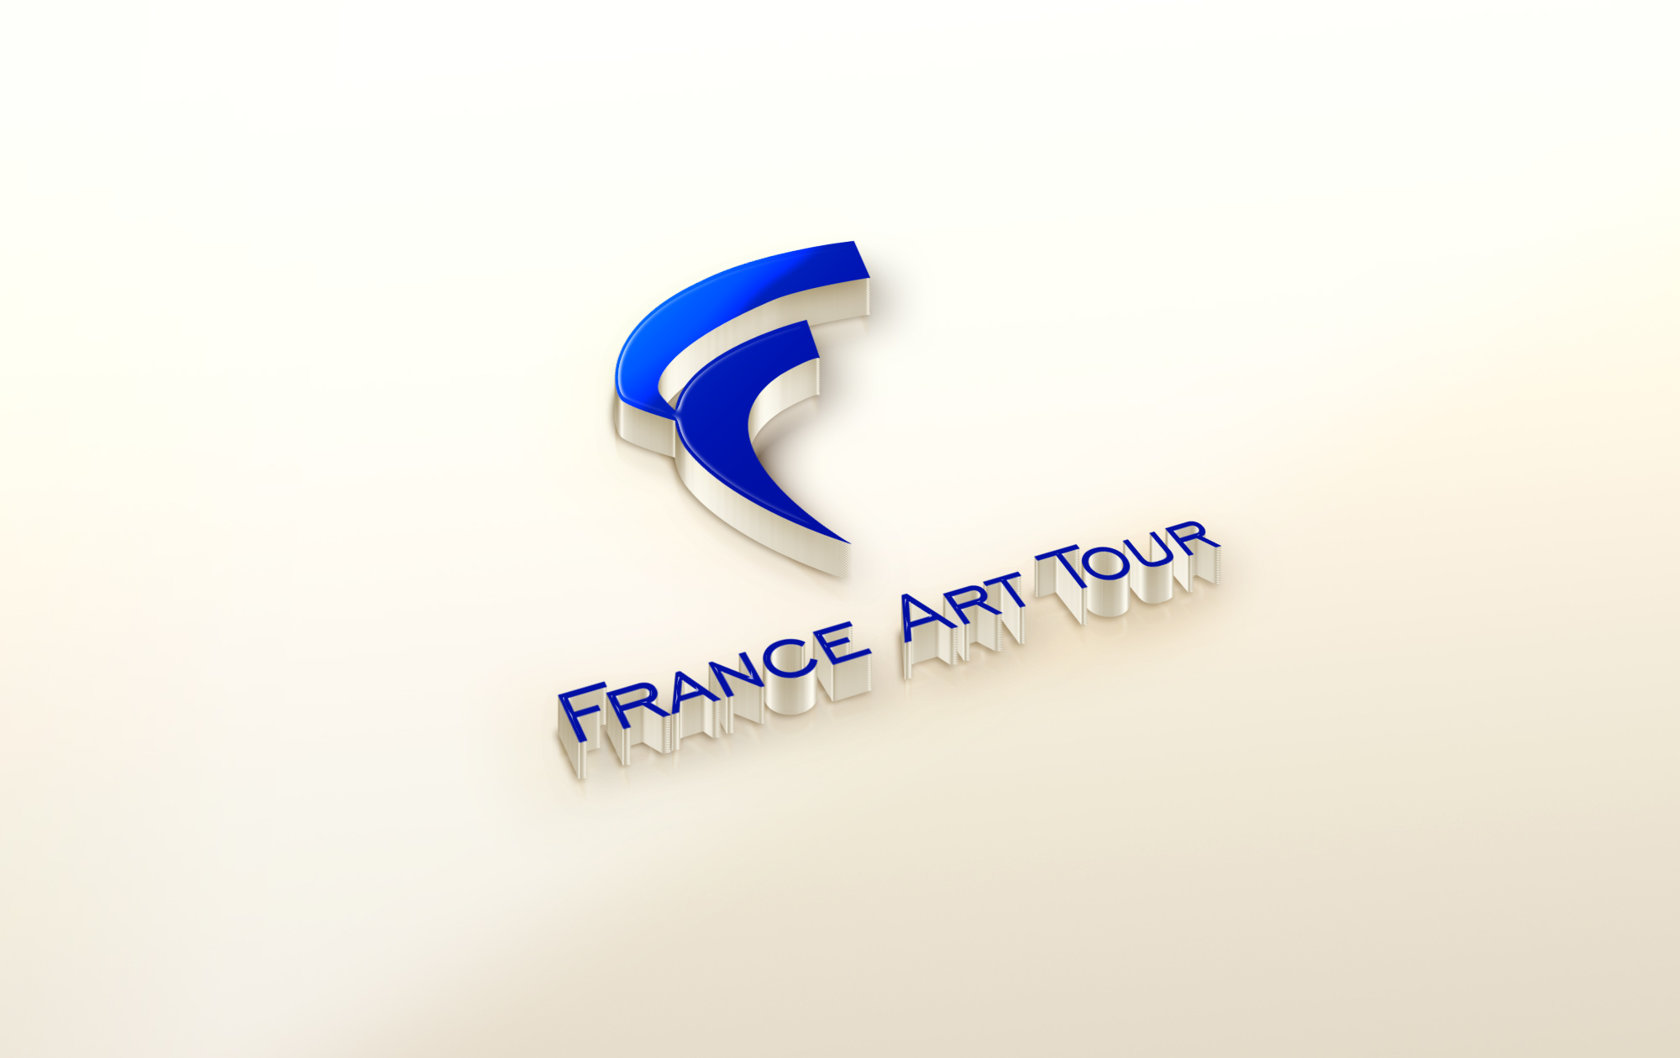 France Art Tour - гид во Франции